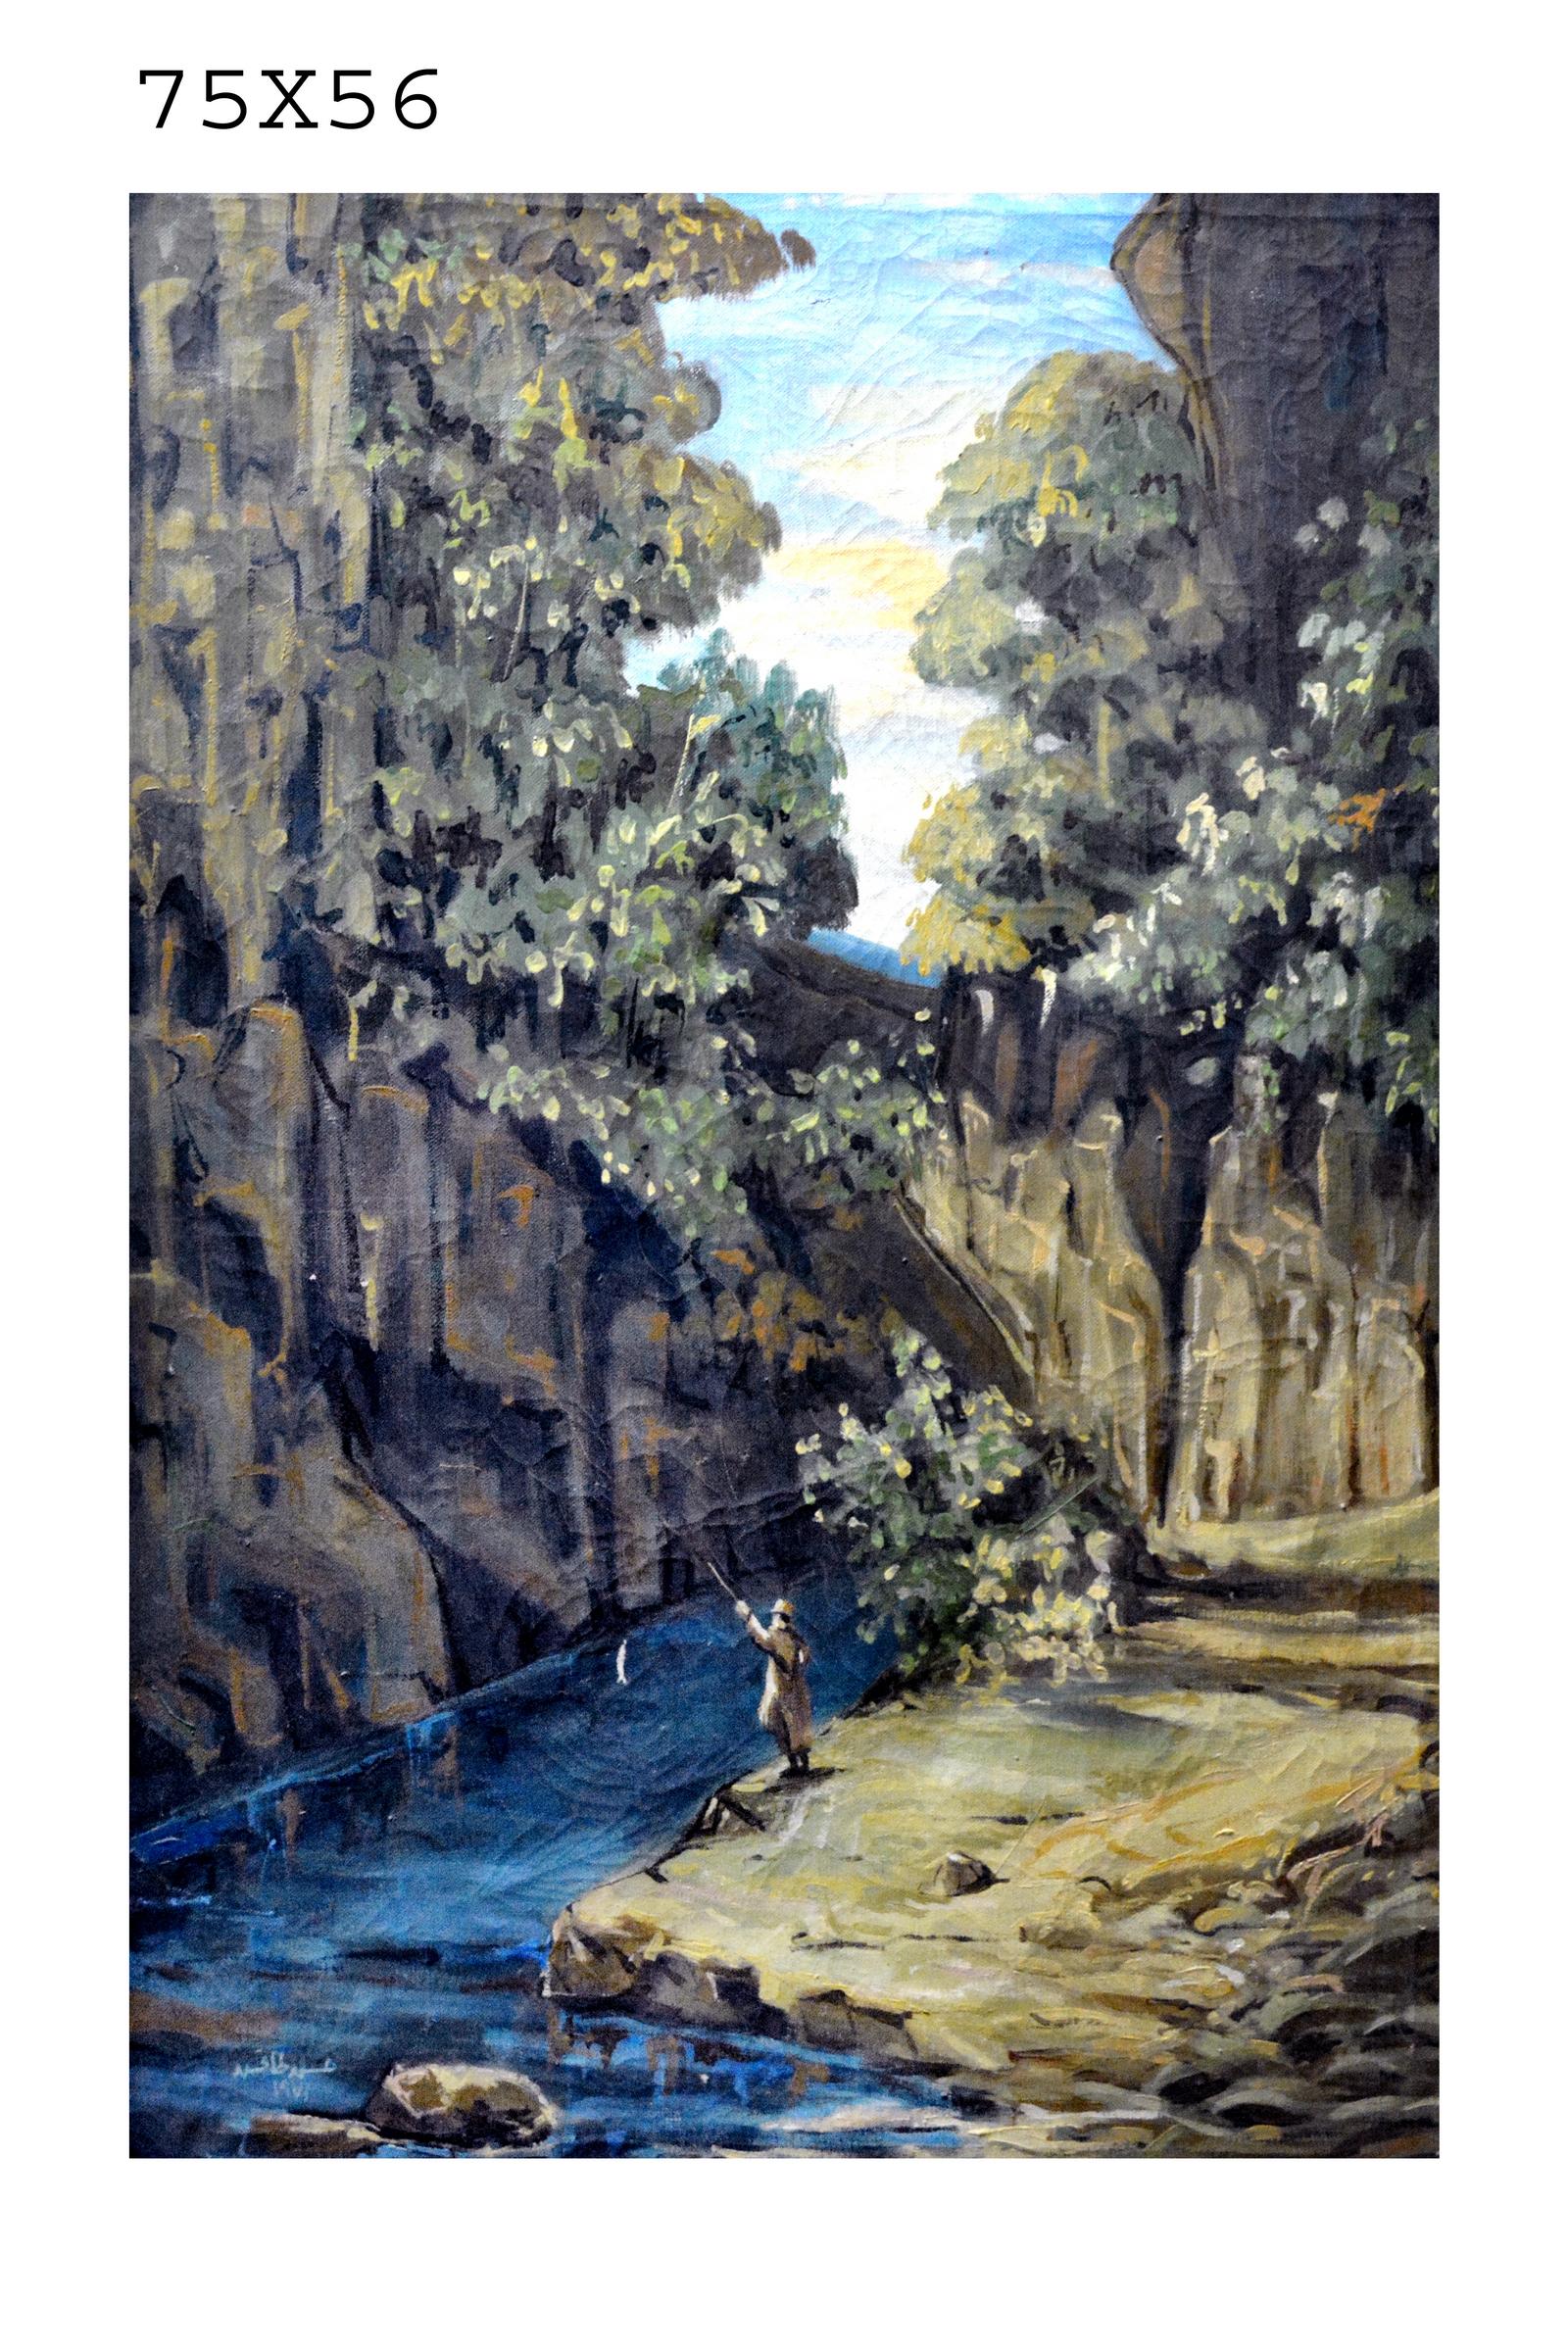 138_269 - Artist Dr. Hassan Tafesh 75 in 56 - الرسام حسن طافش.JPG